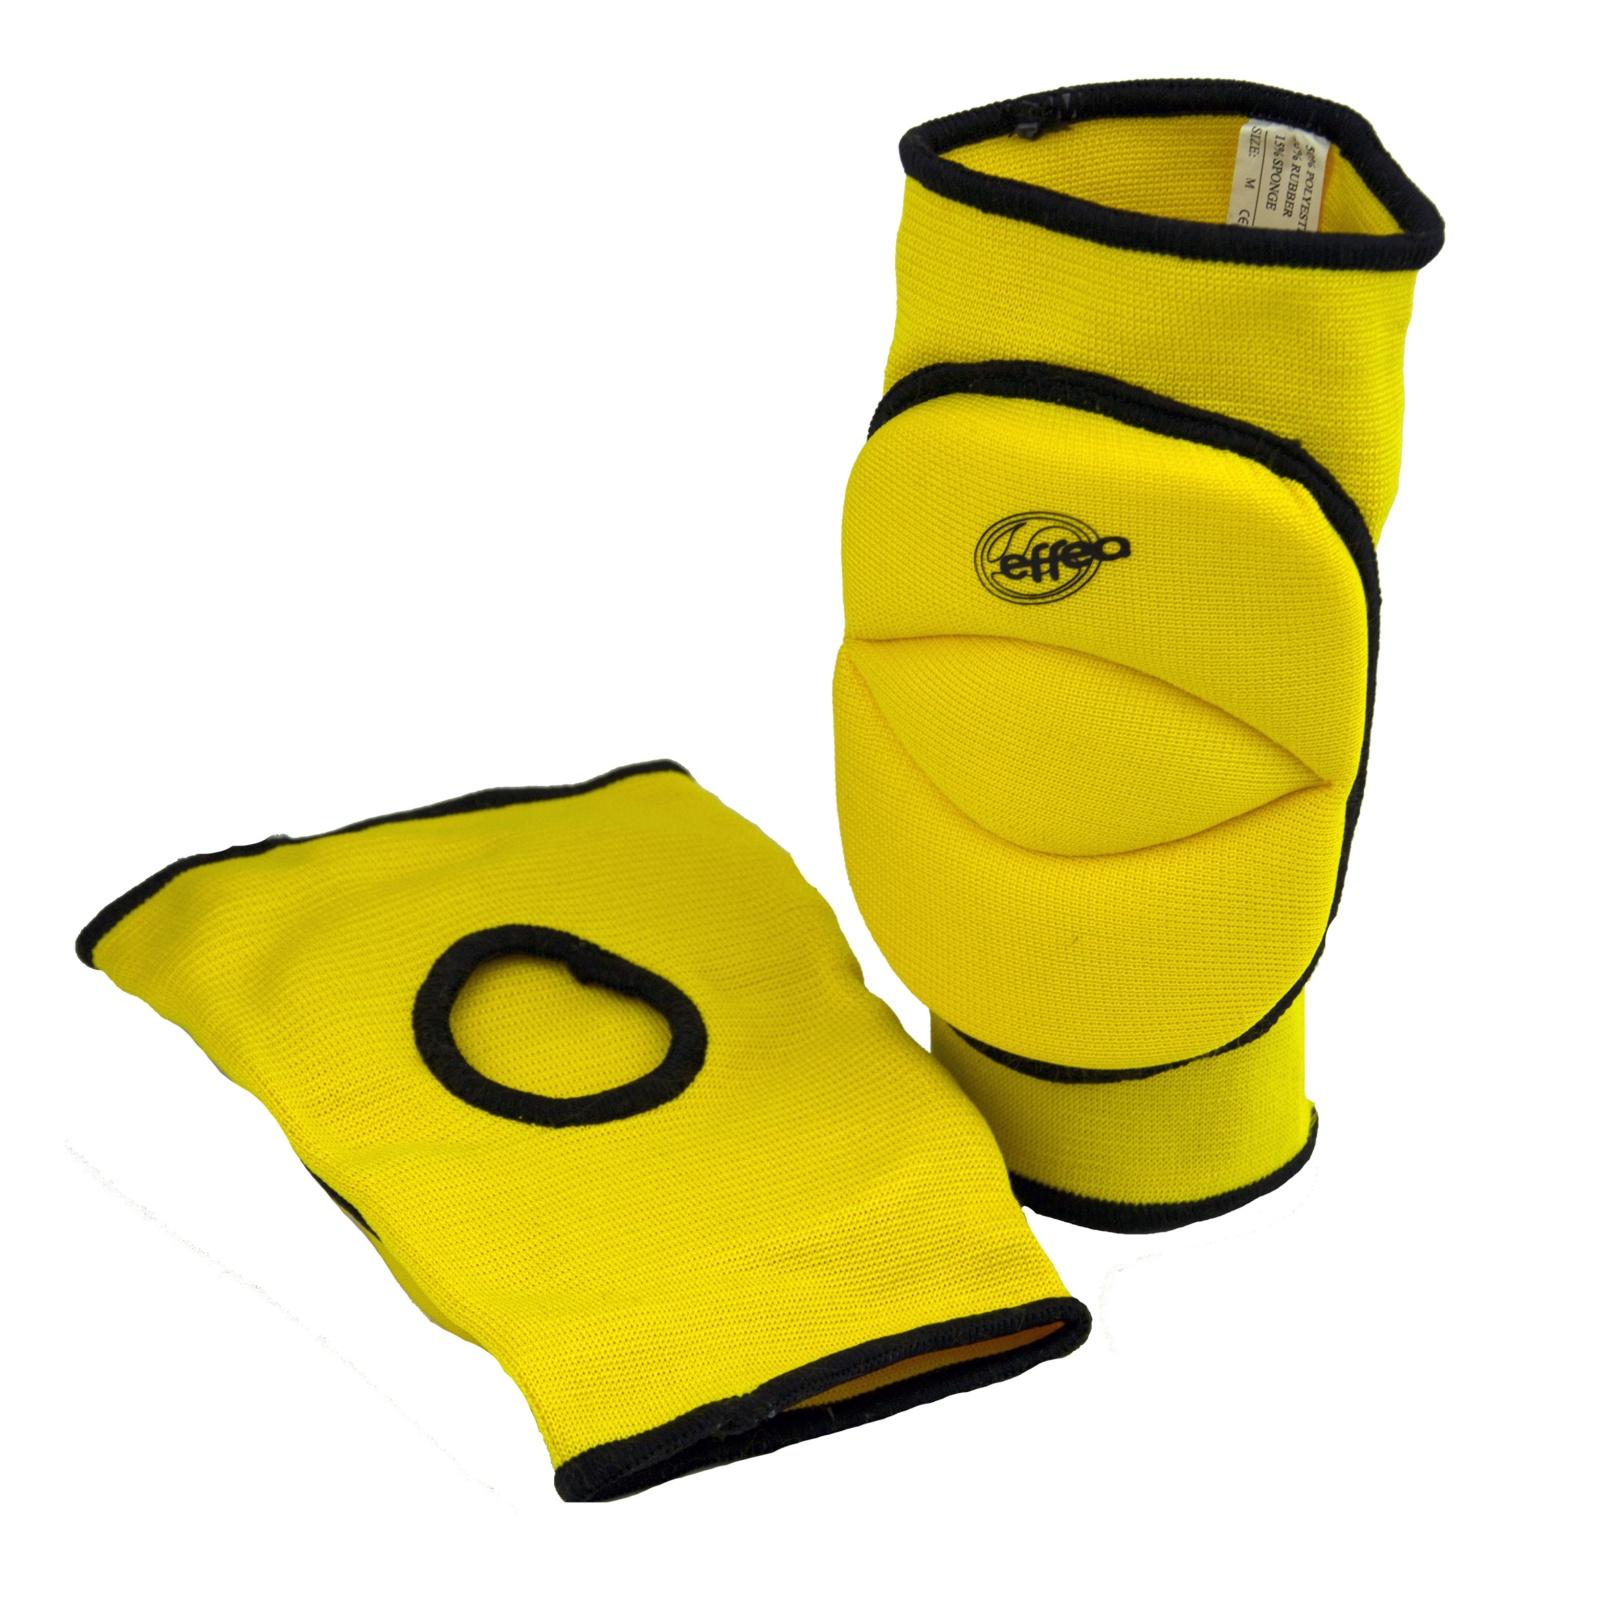 Volejbalové chrániče kolien EFFEA 6644 KD žlté